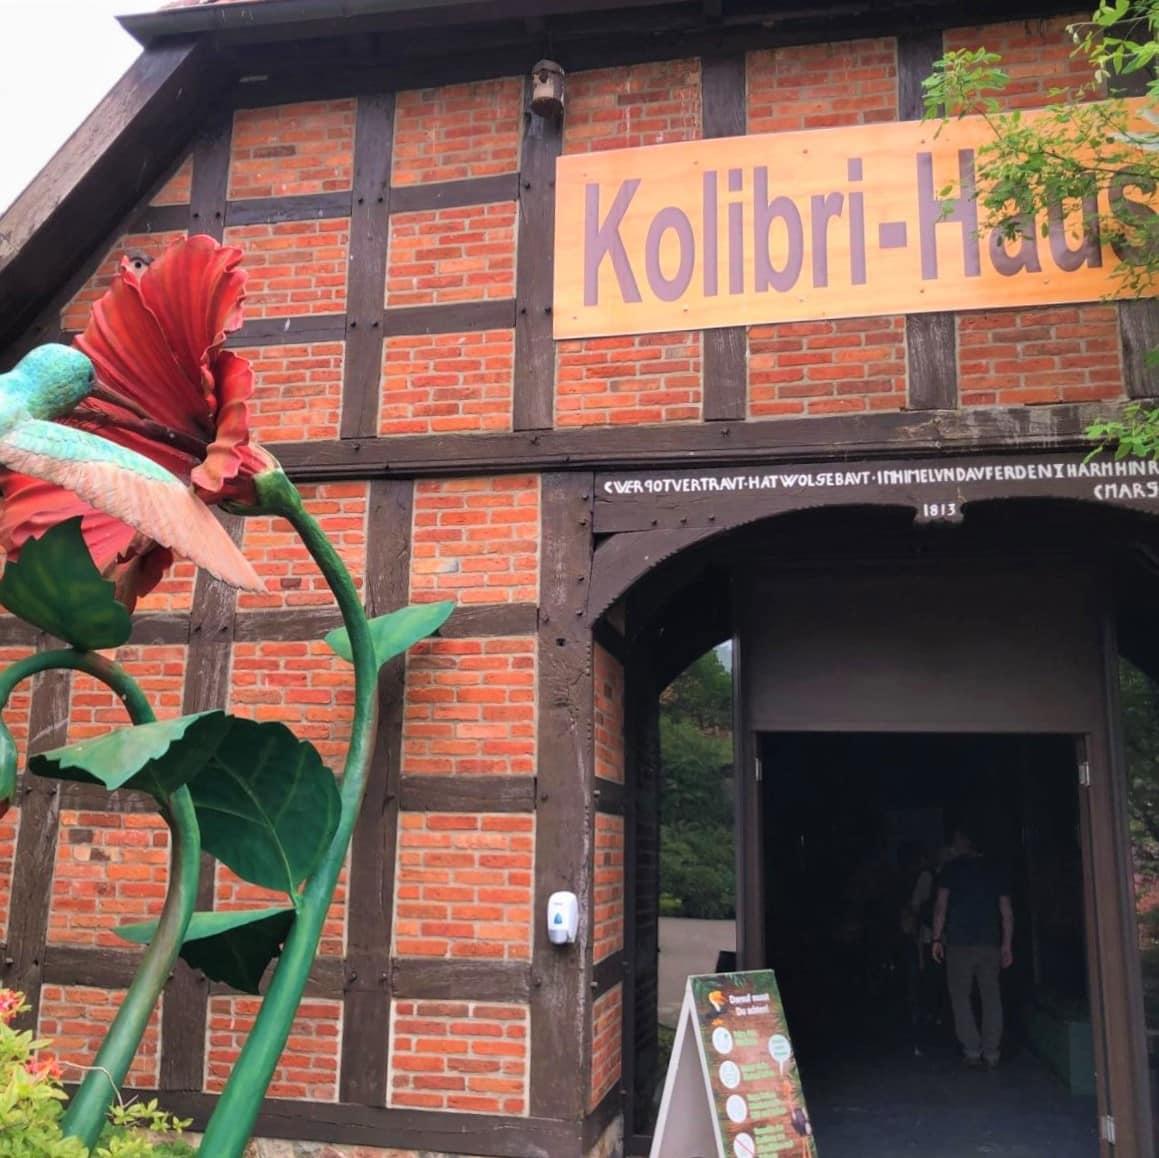 style hannover vogelpark walsrode 11 - Der größte Vogelpark der Welt – ist in Walsrode ...